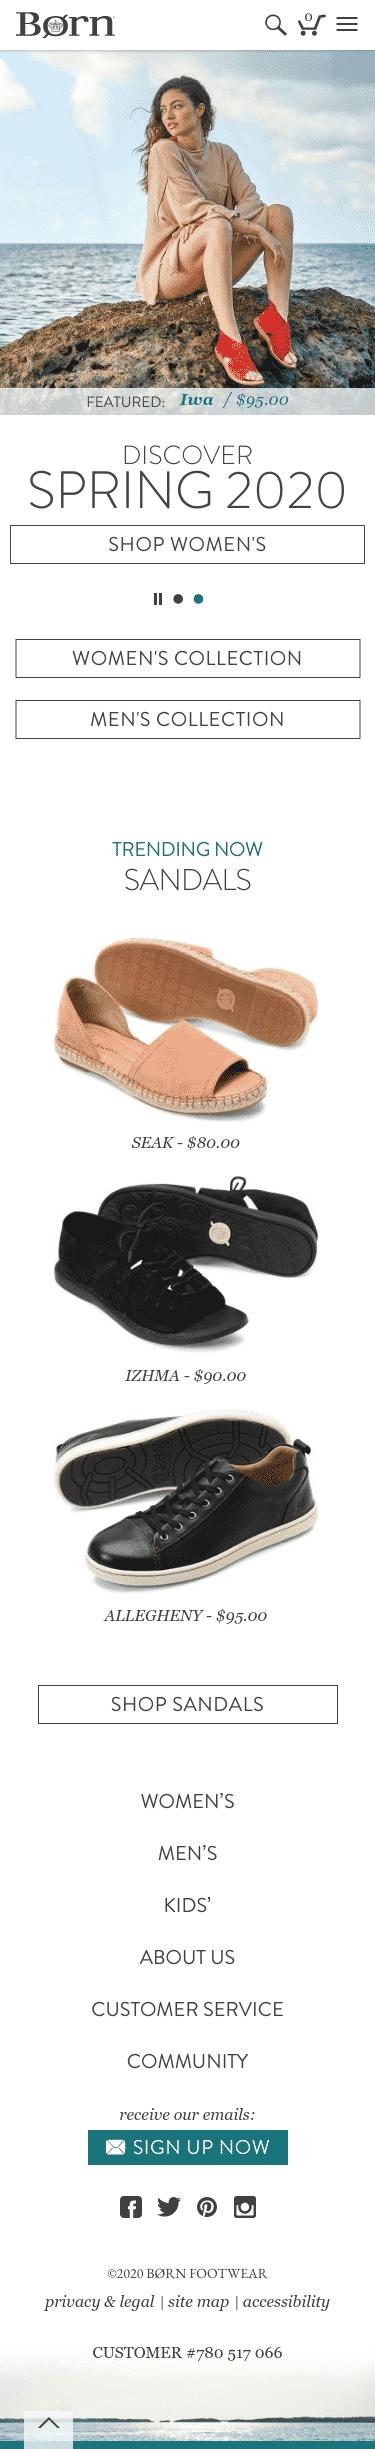 Born Shoes Coupon